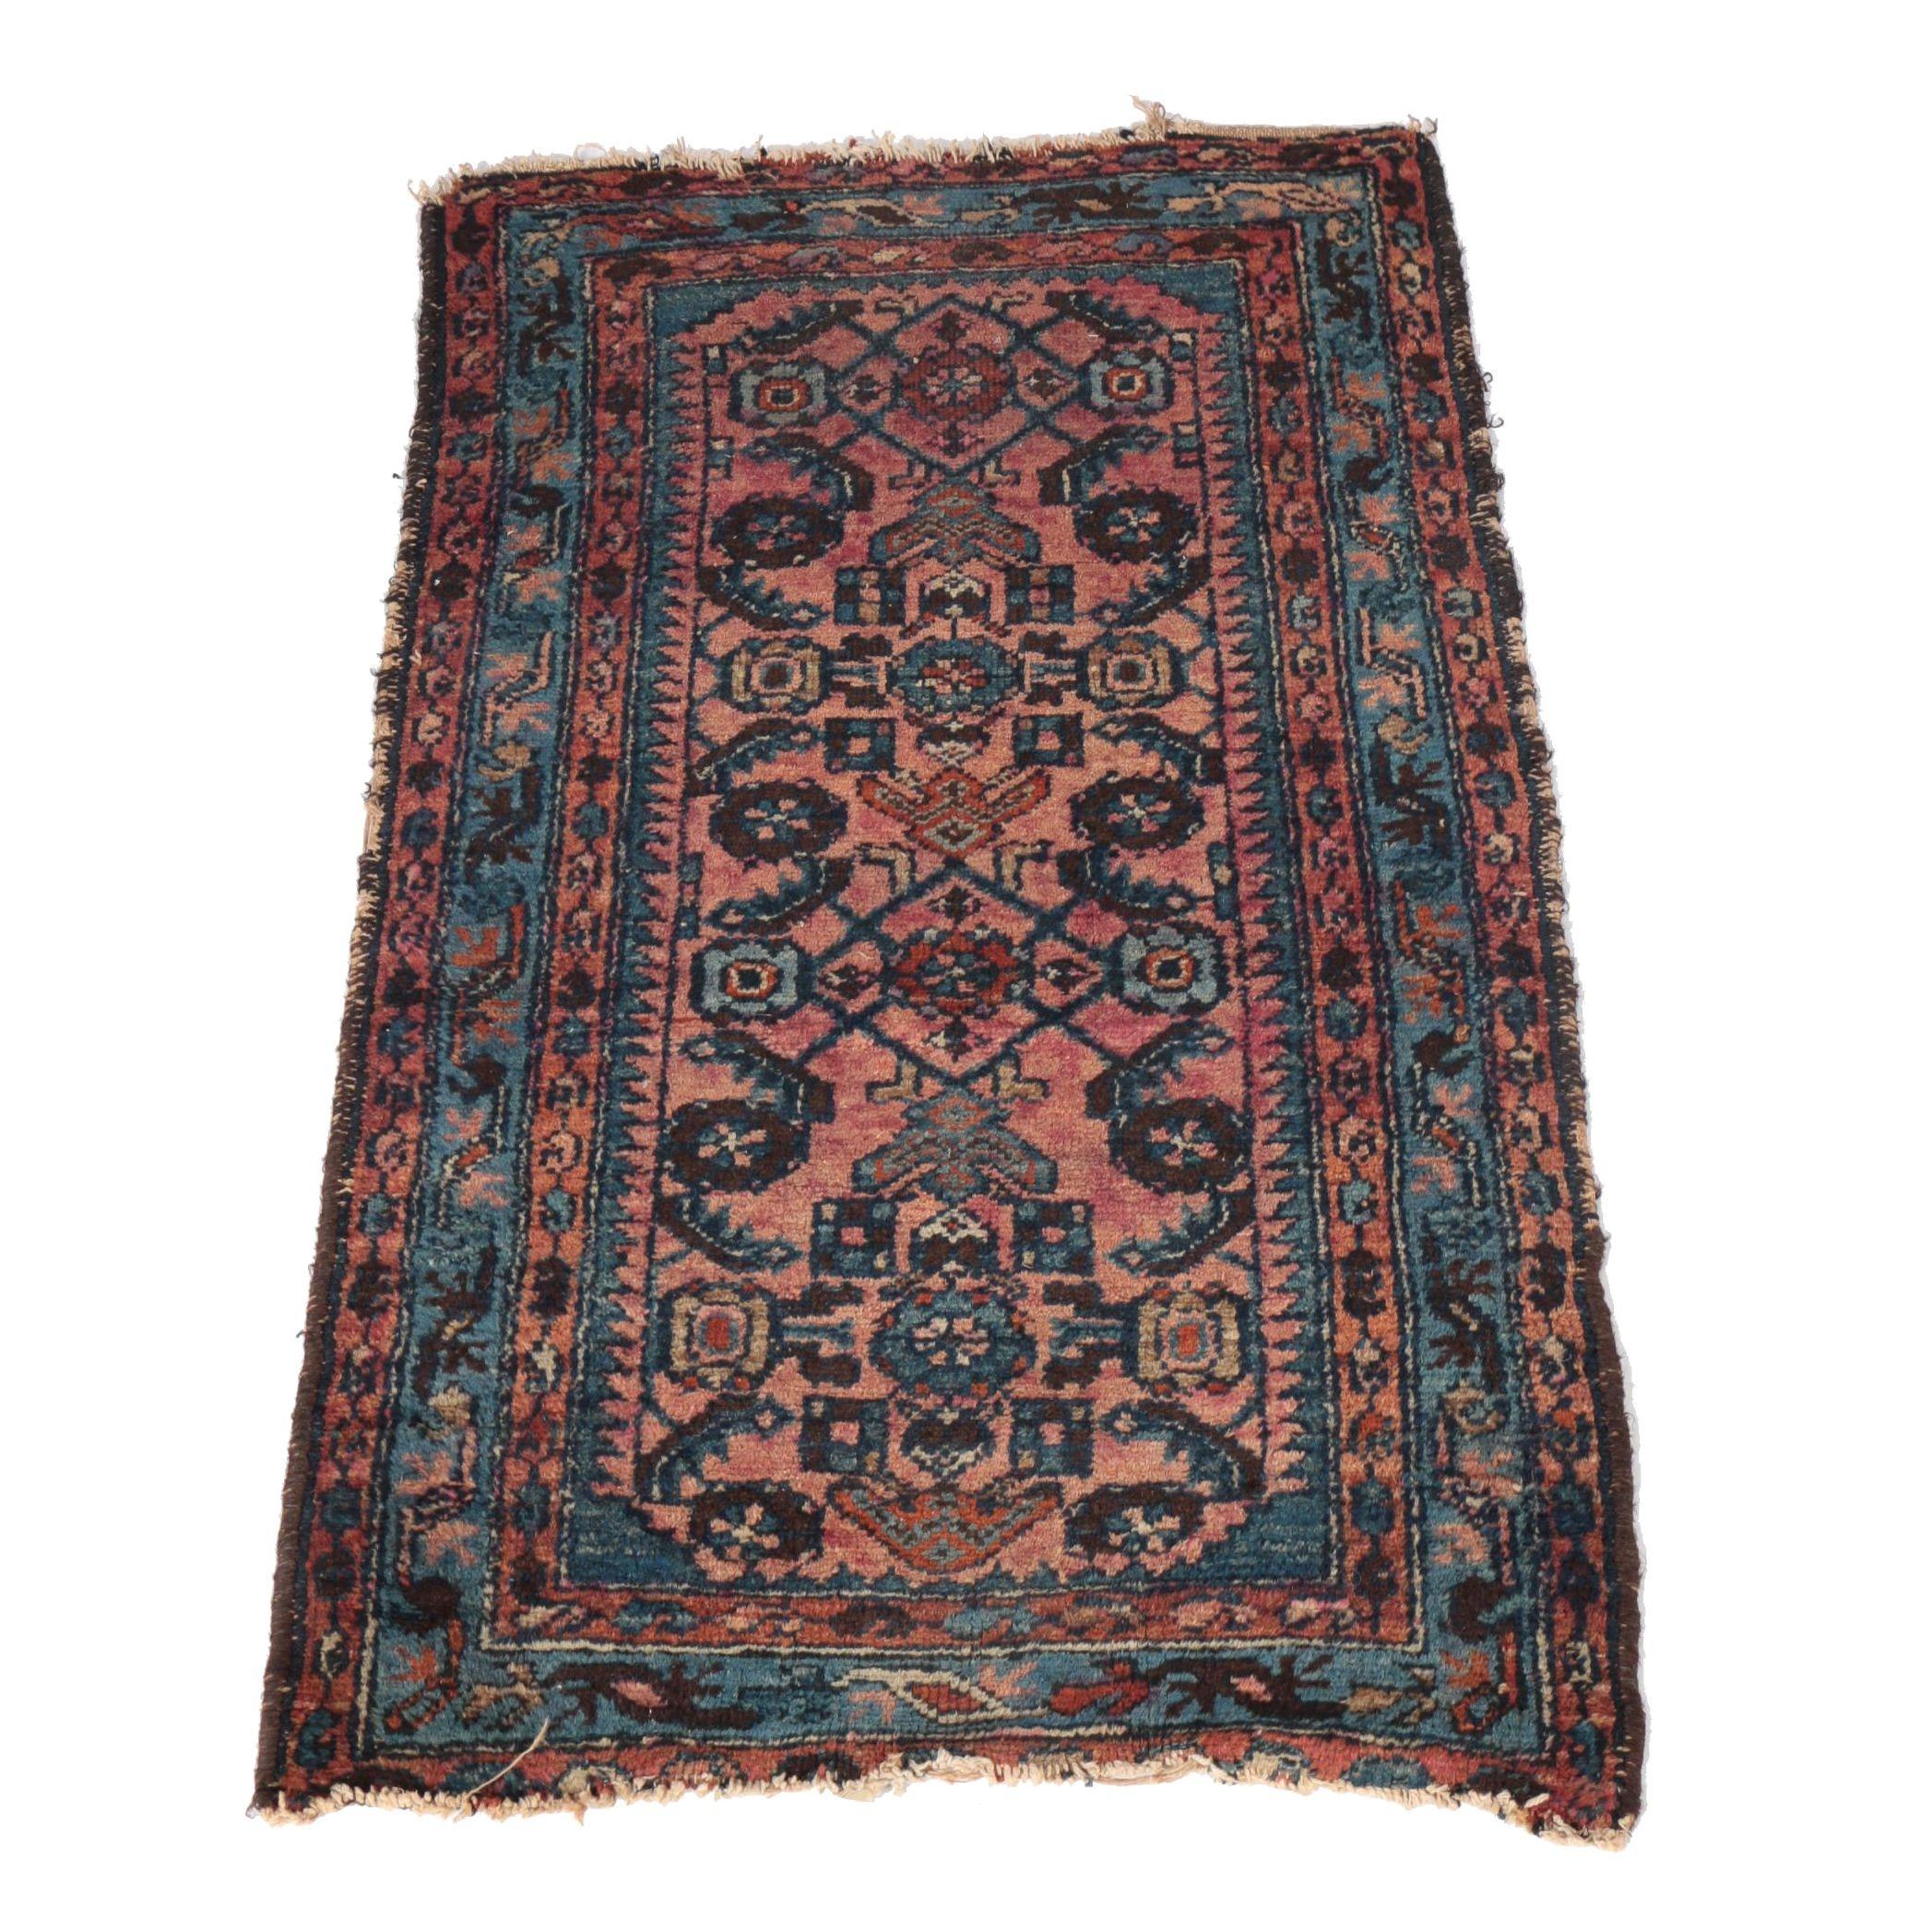 Hand-Knotted Turkish Bijar Wool Accent Rug